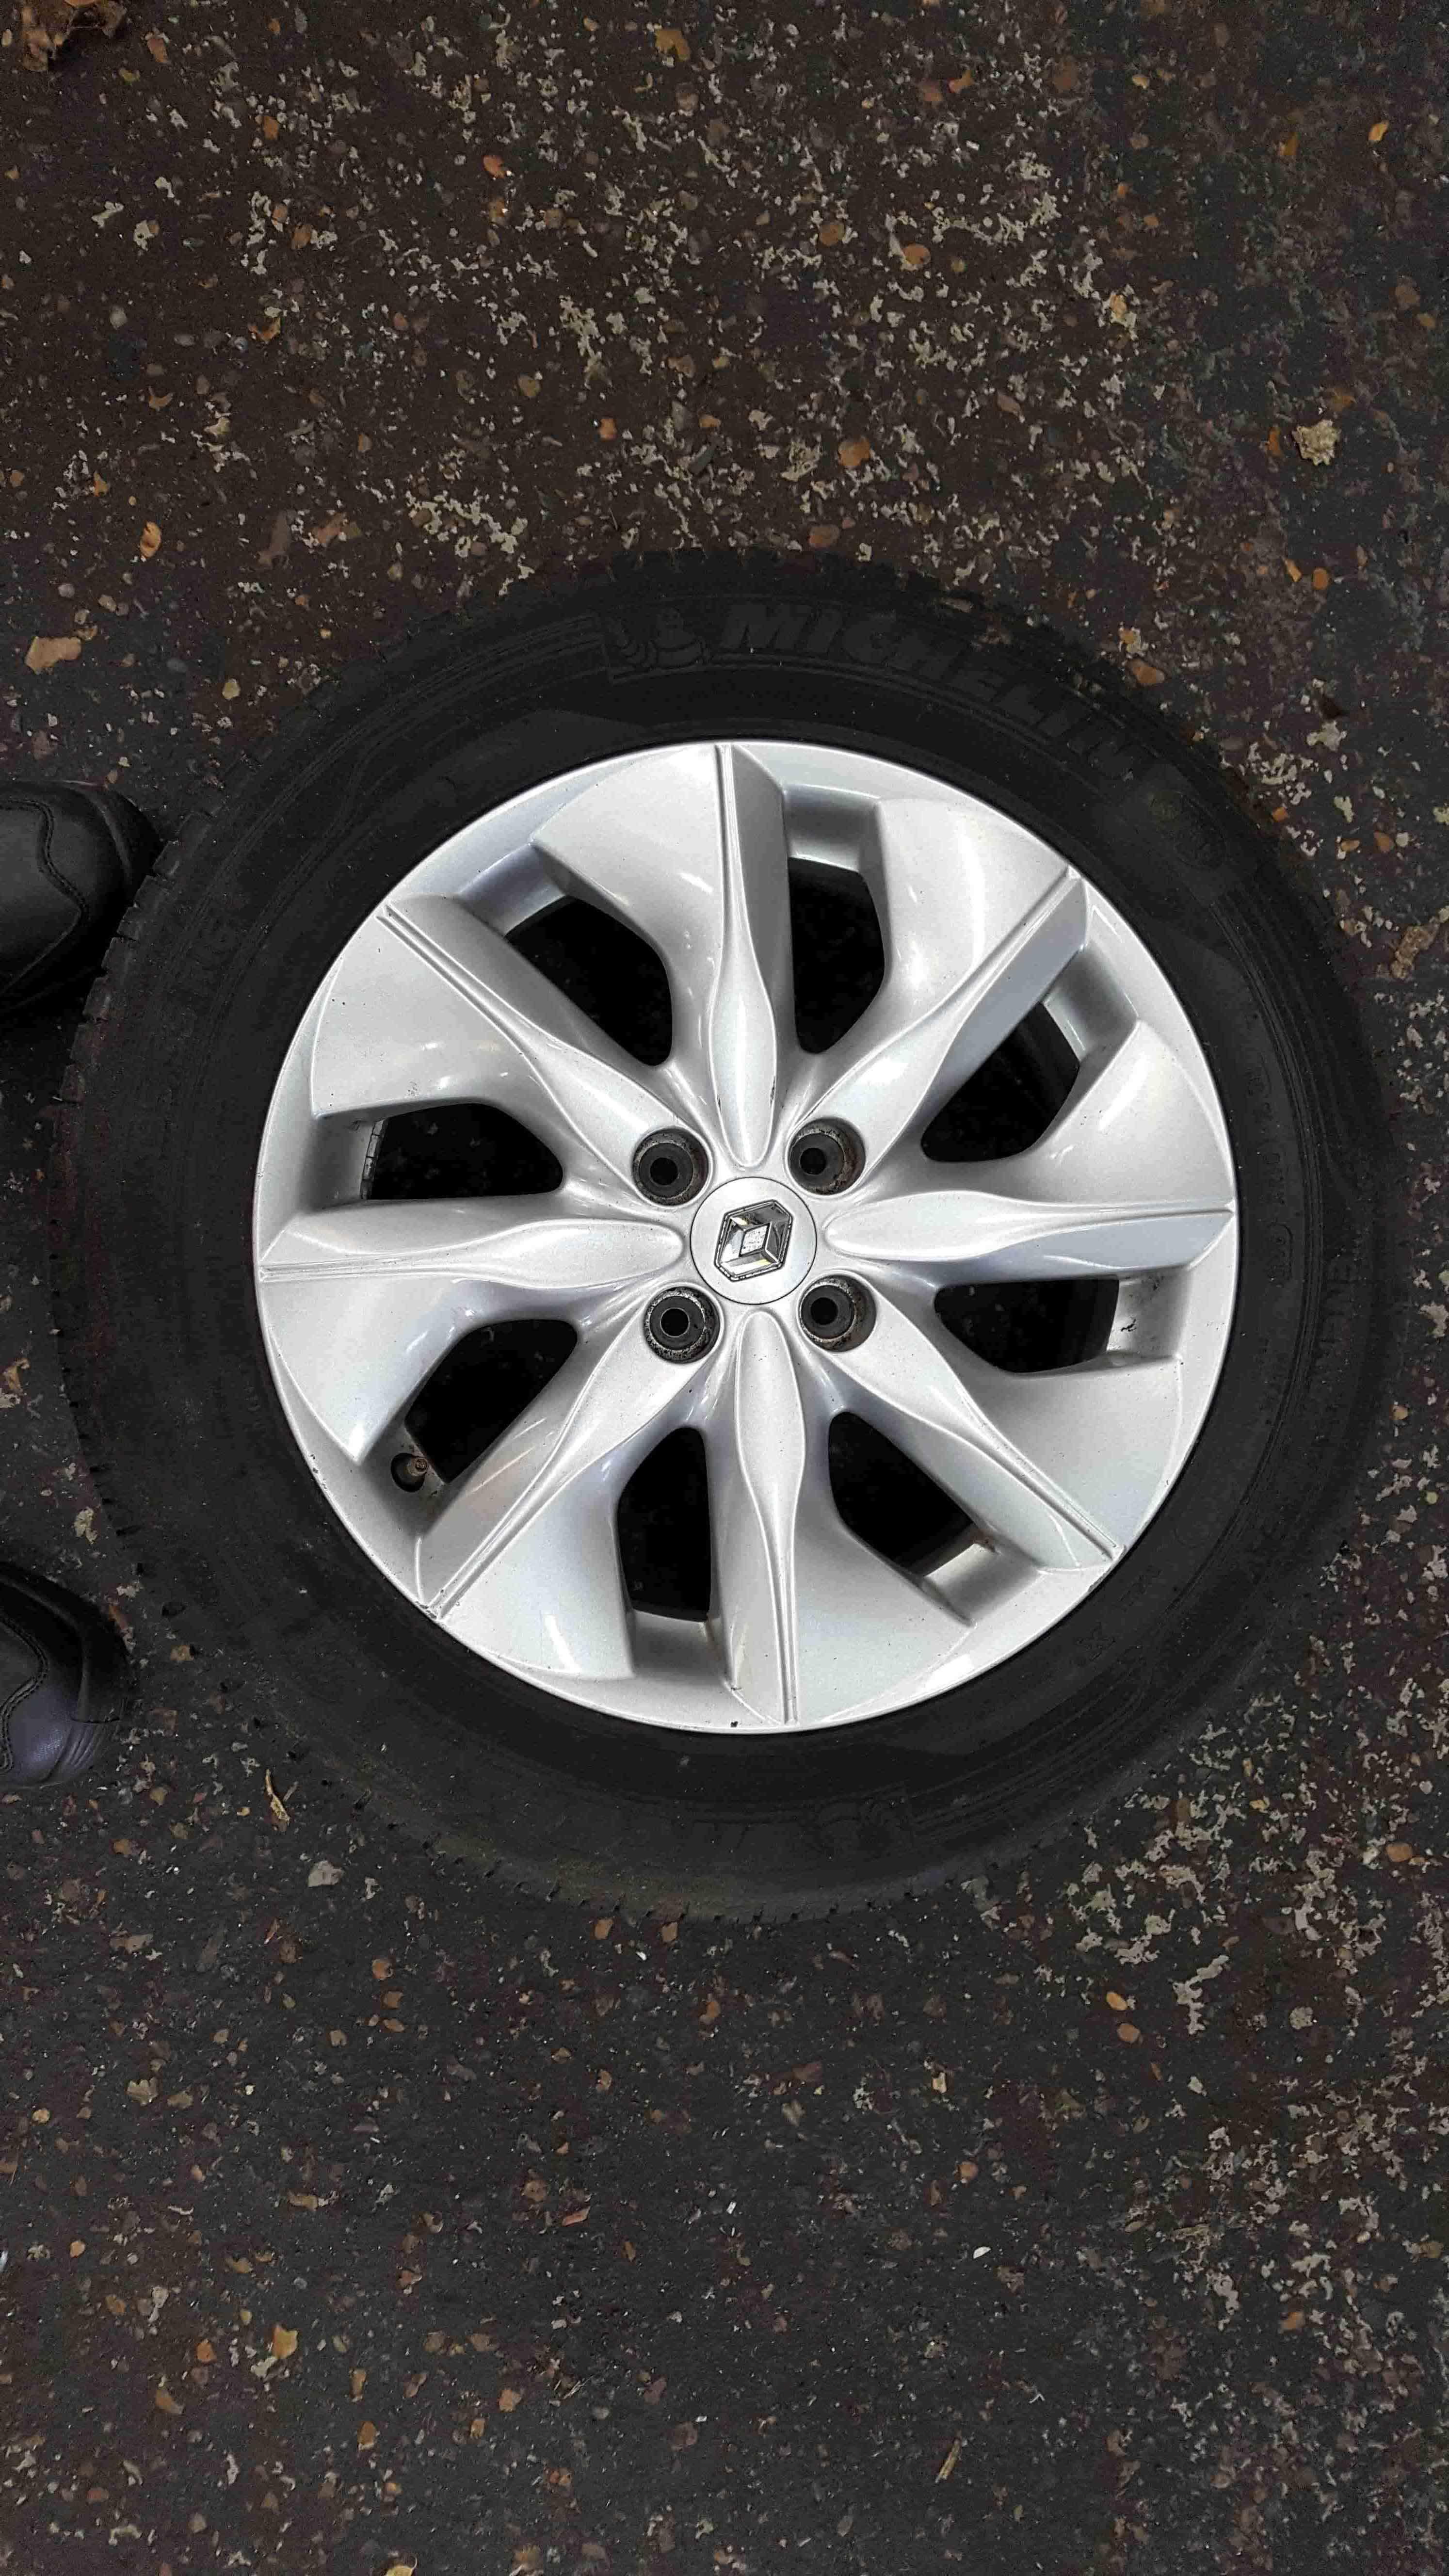 Renault Zoe 2012-2016 Aerotronic Alloy Wheel 16inch 16 4/5 403005079